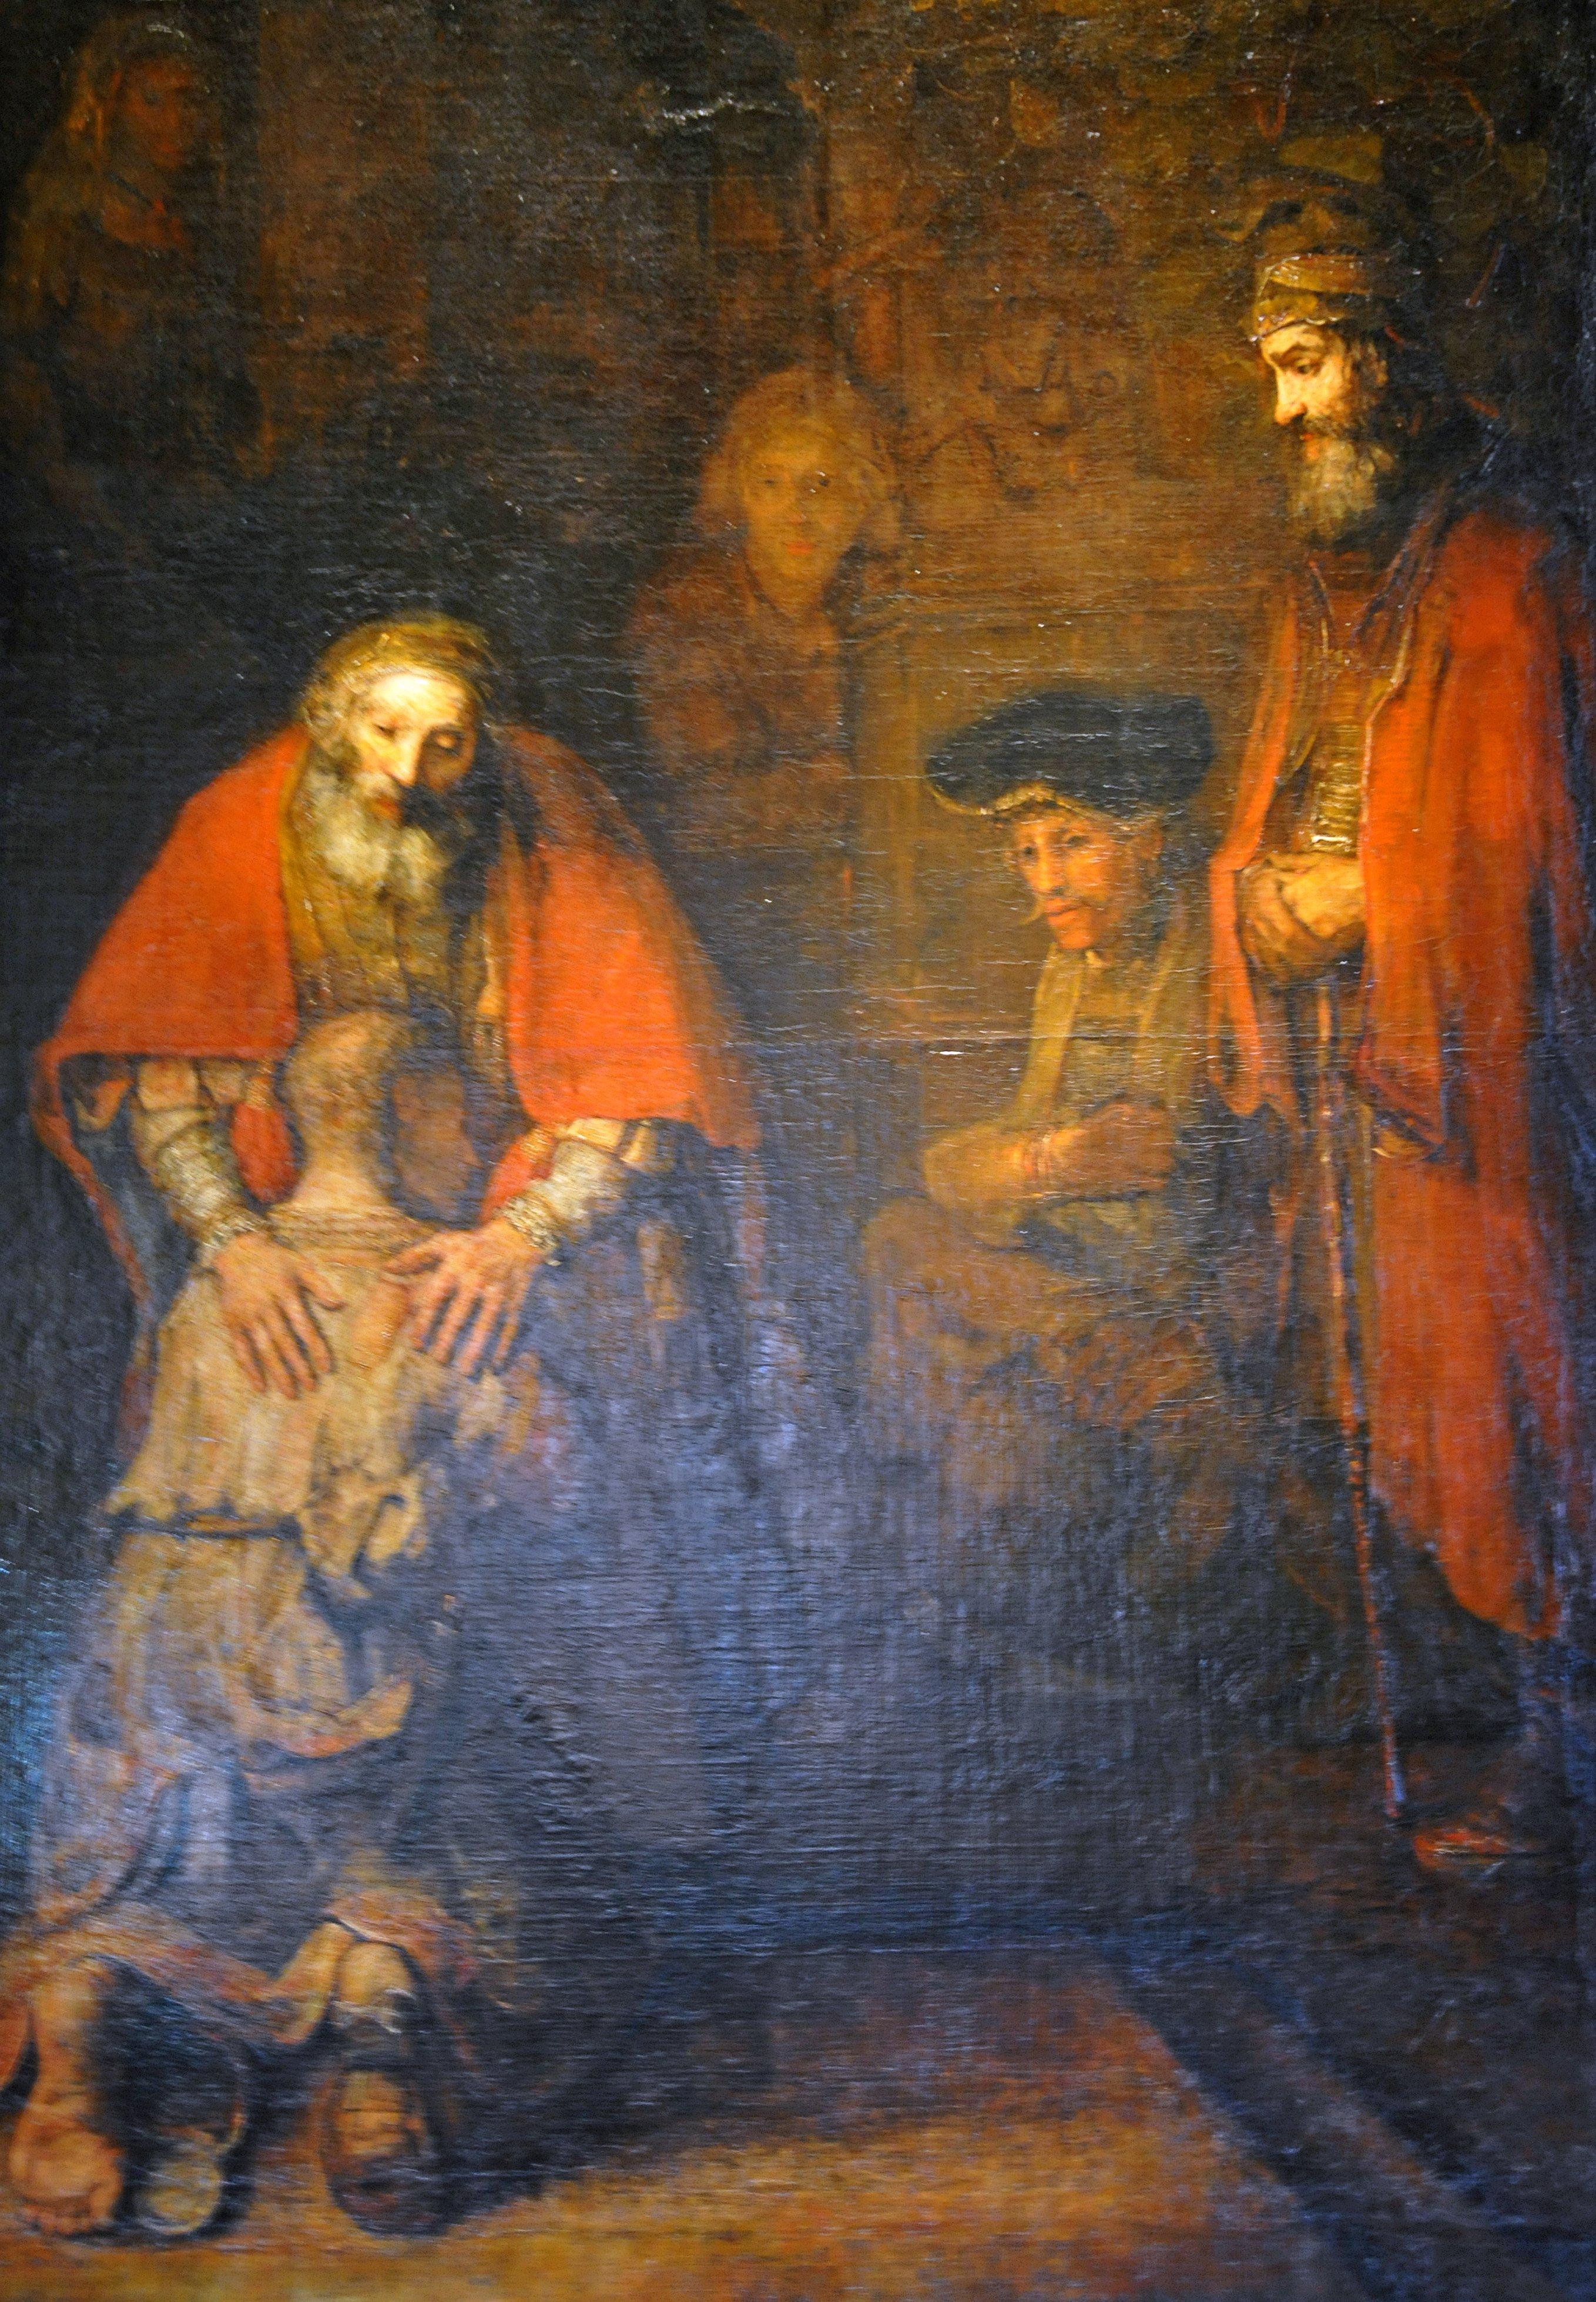 Rembrandt, Prodigal Son